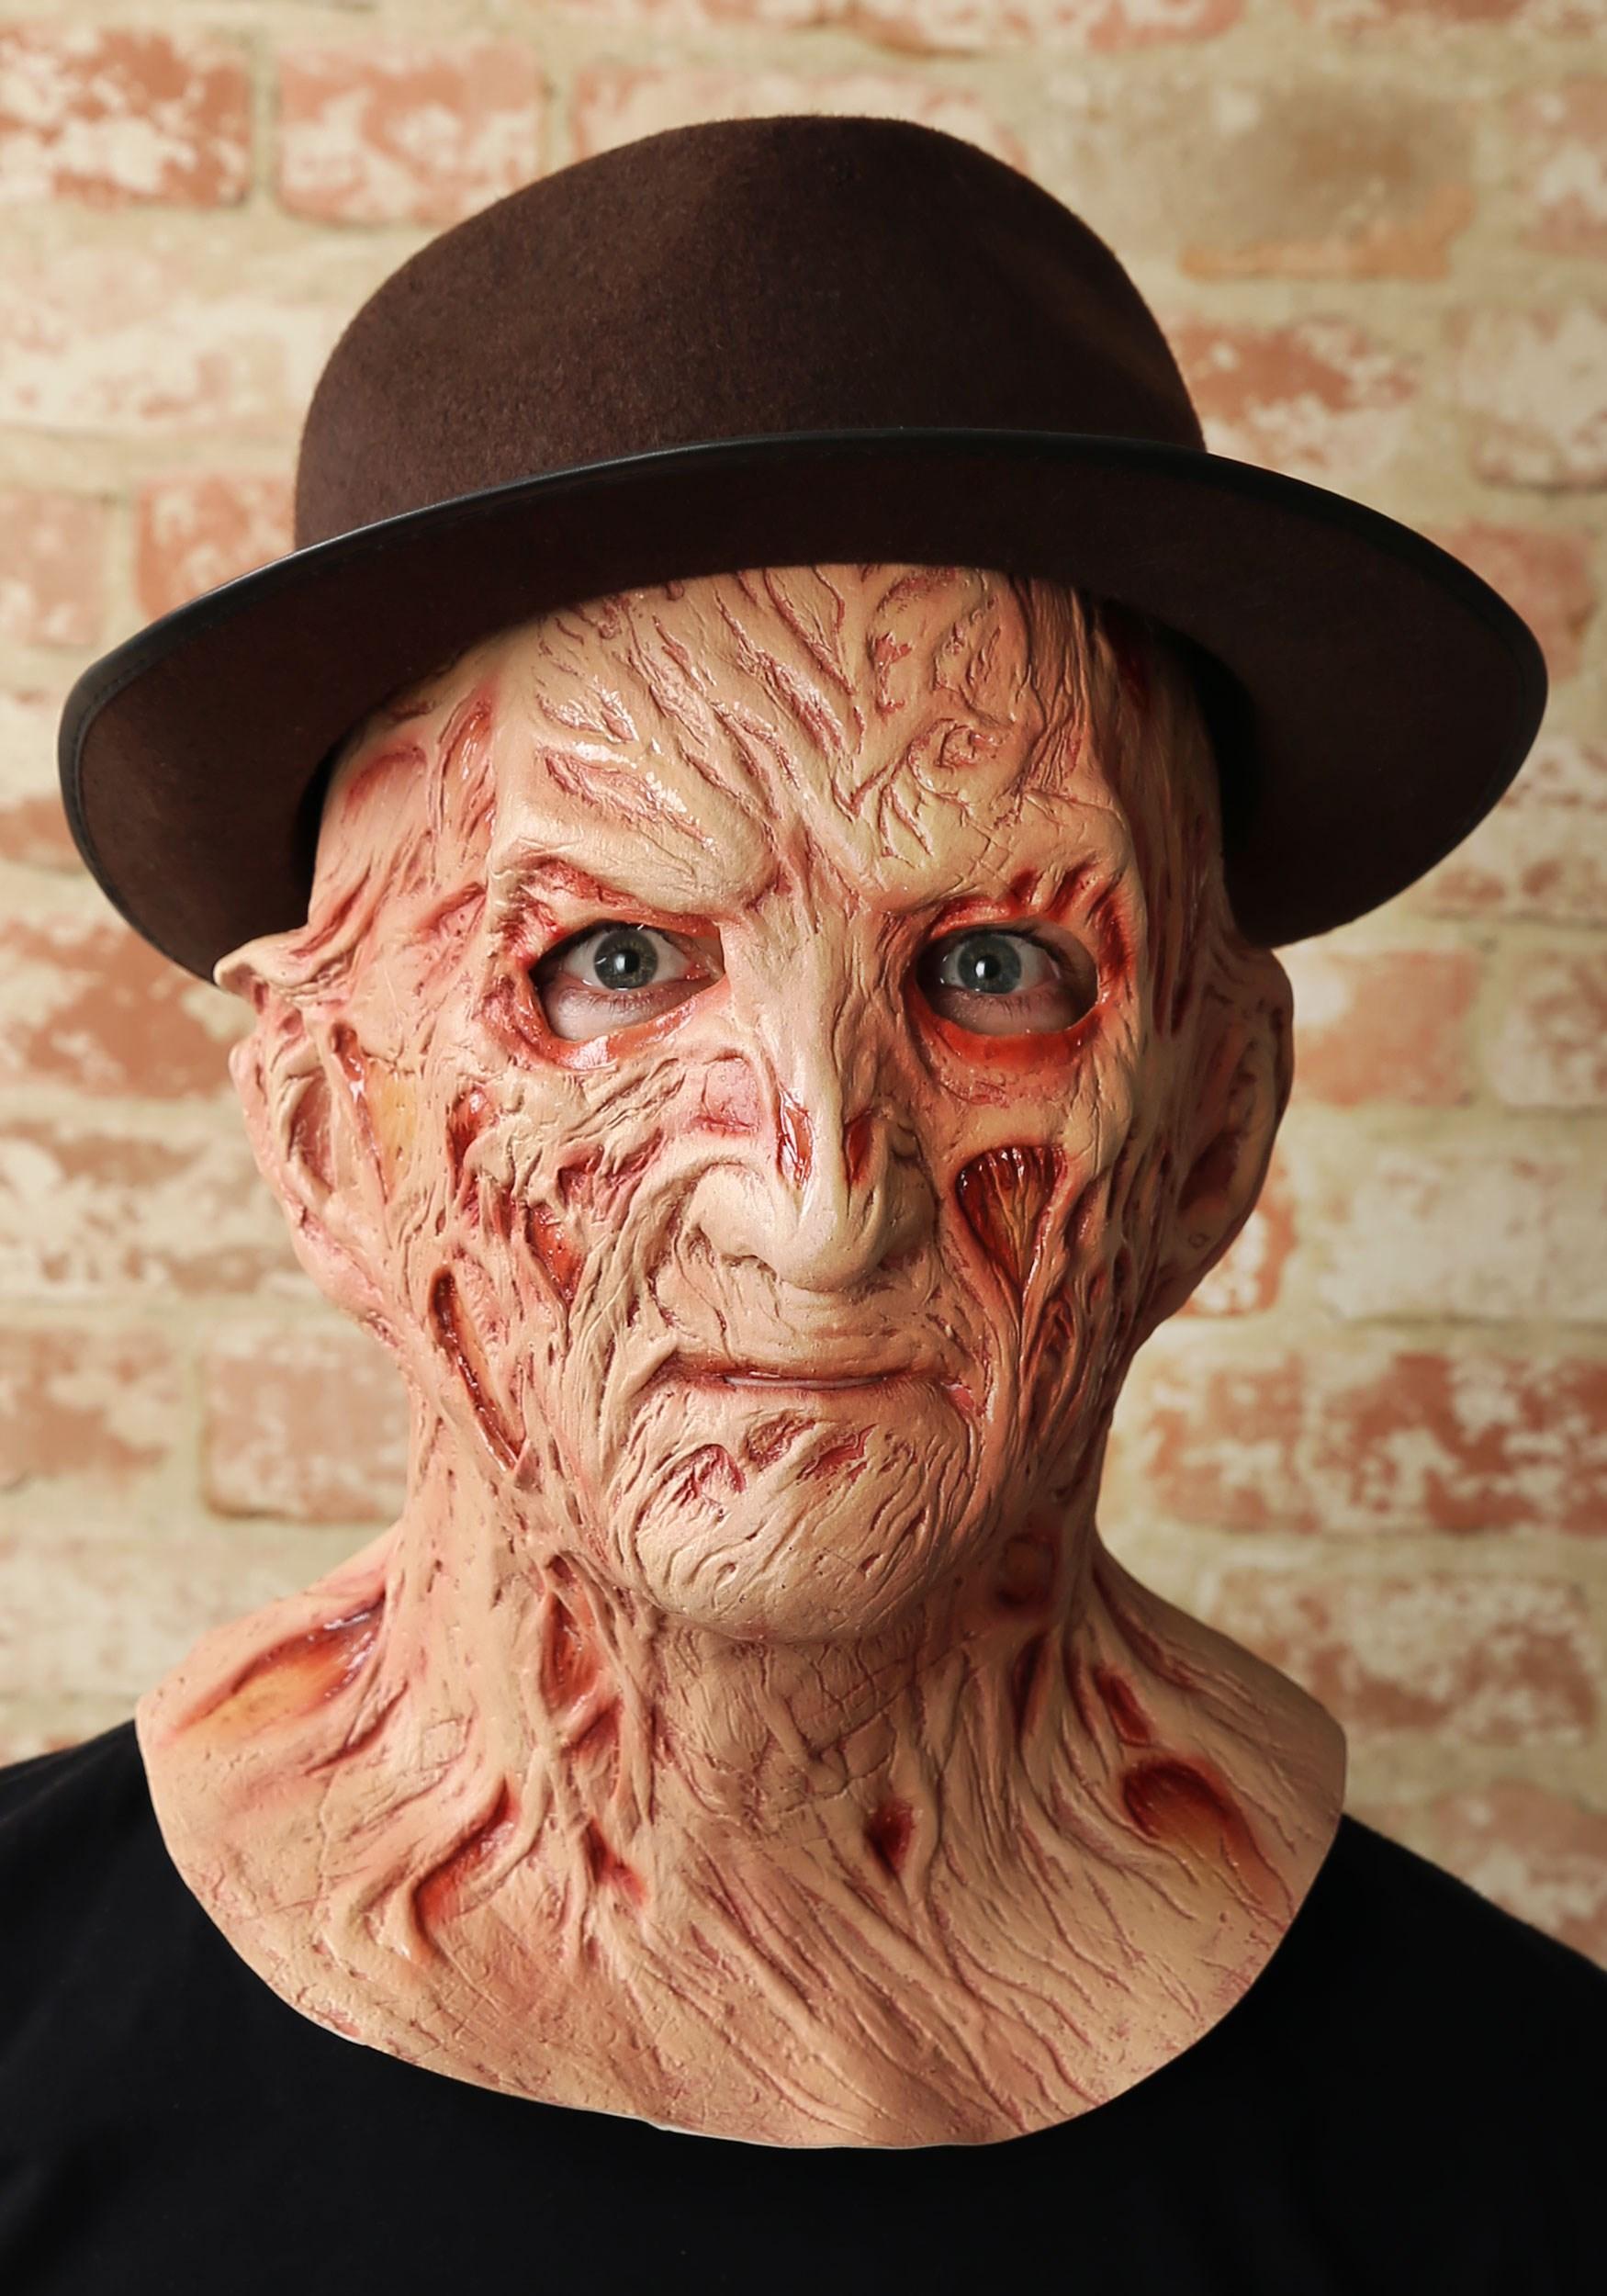 Freddy Krueger Nightmare on Elm Street 4 Mask